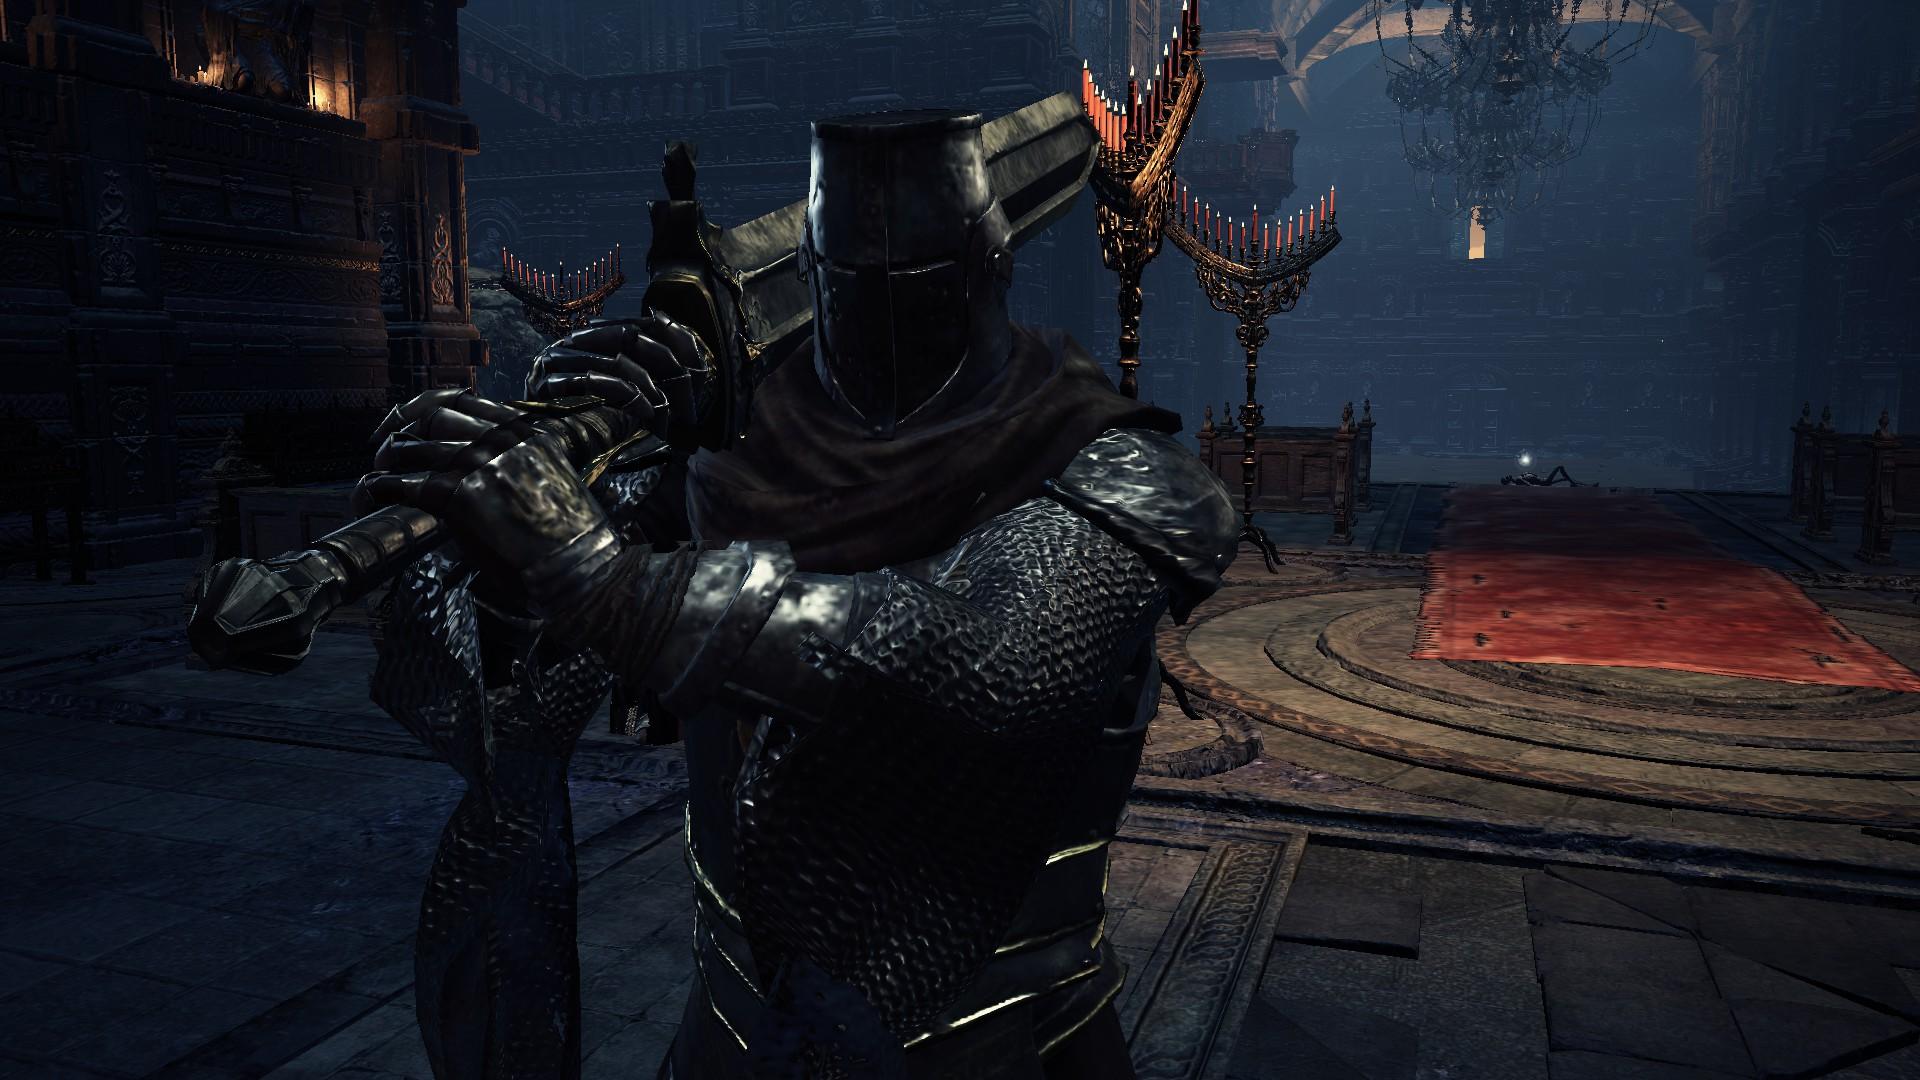 knight-of-the-deep.jpg